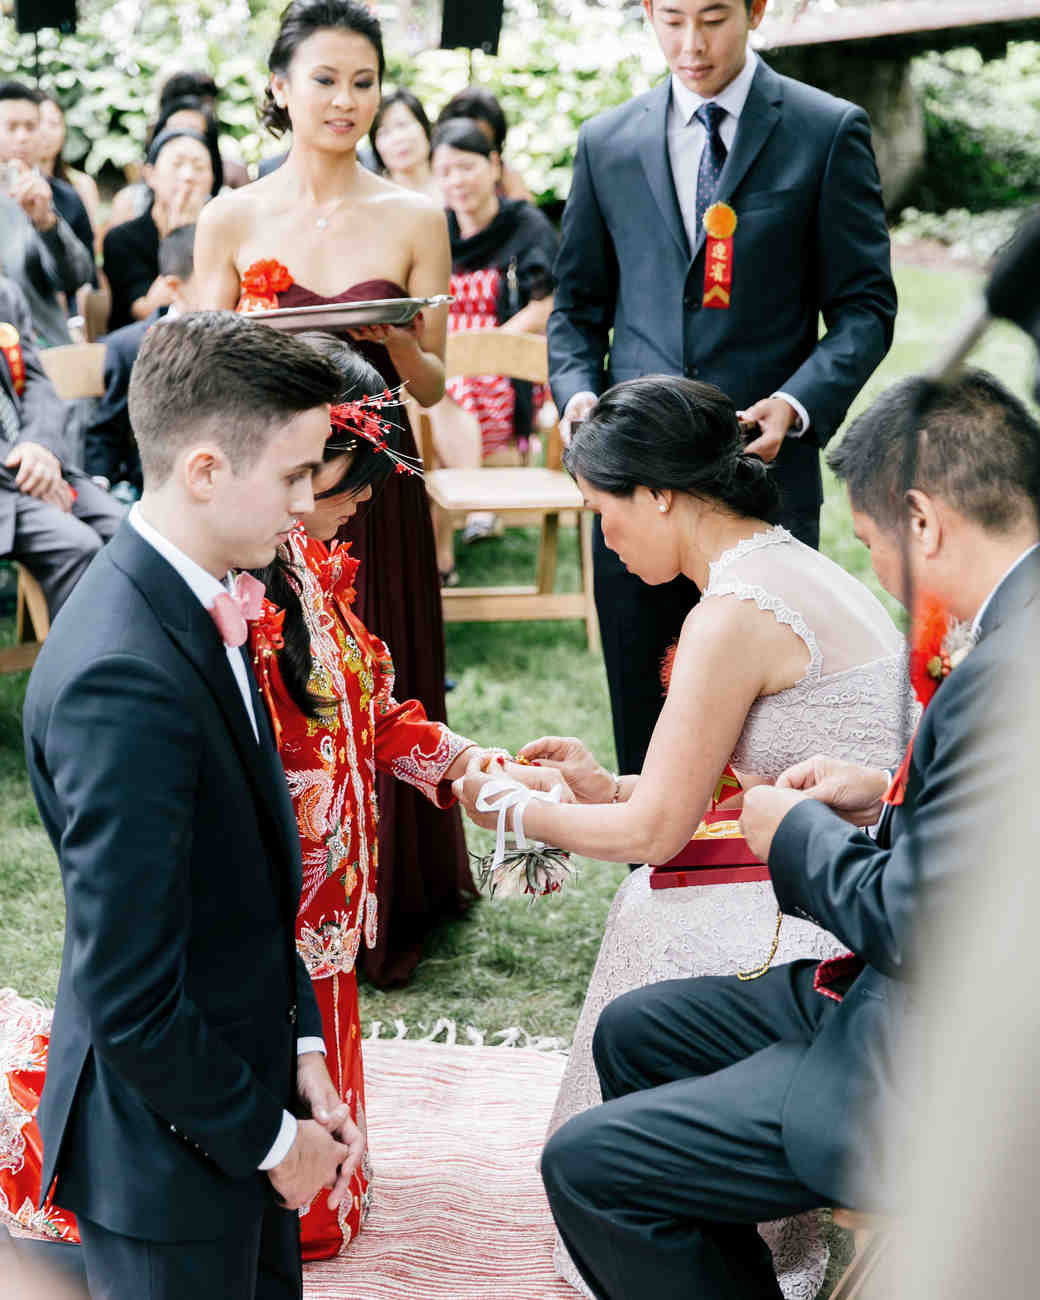 susan-tom-wedding-teaceremony-187-s112692-0316.jpg